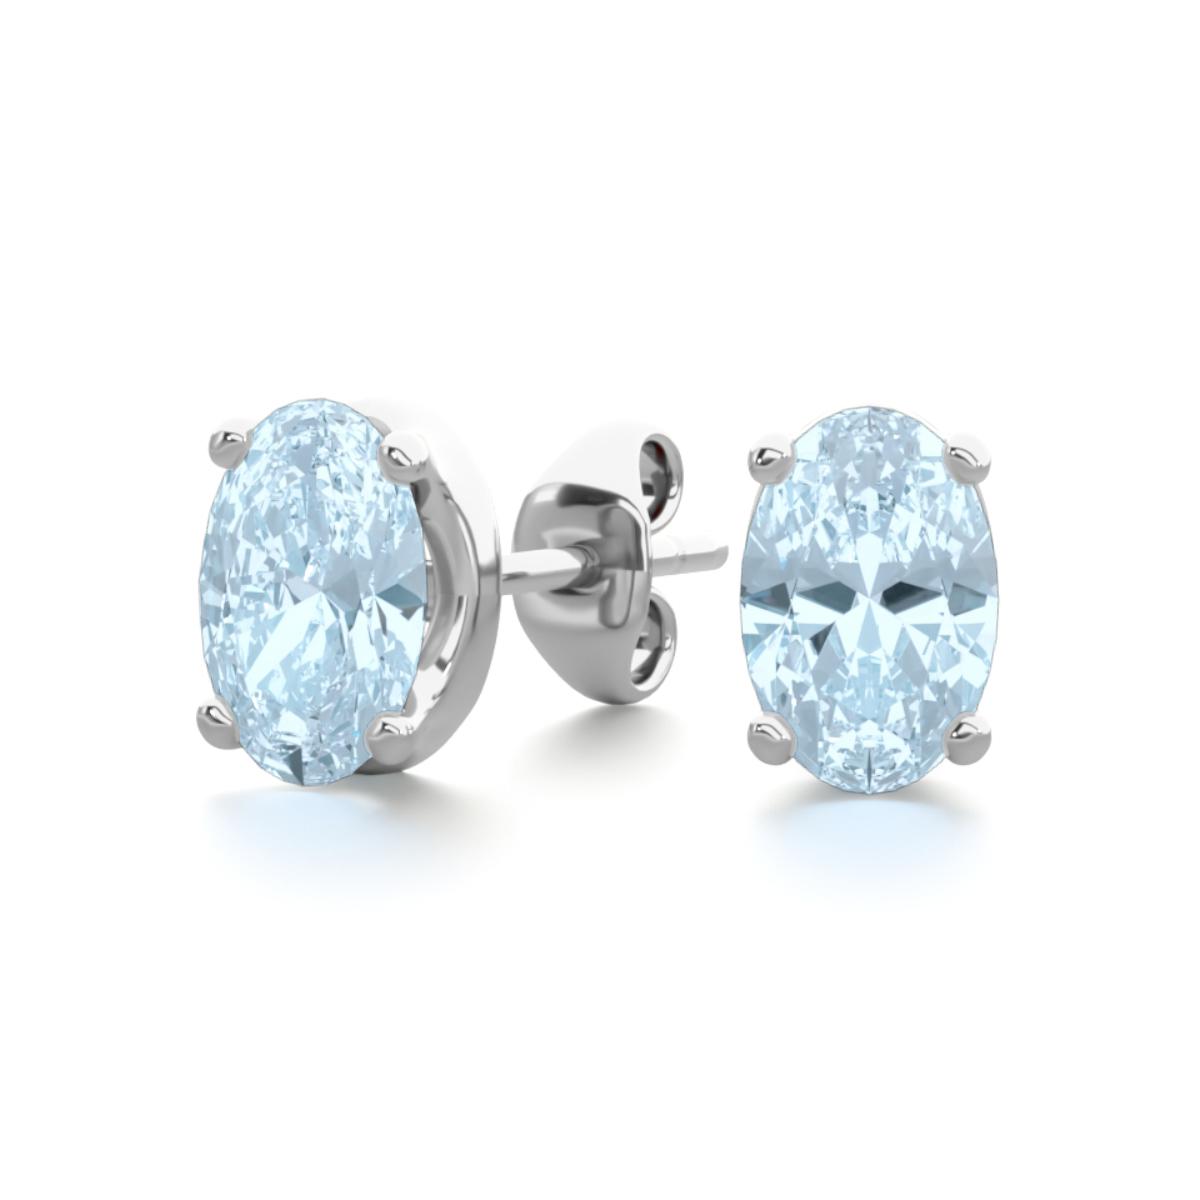 4889c4f66c7 1 Carat Oval Aquamarine Stud Earrings in Sterling Silver | Blue ...